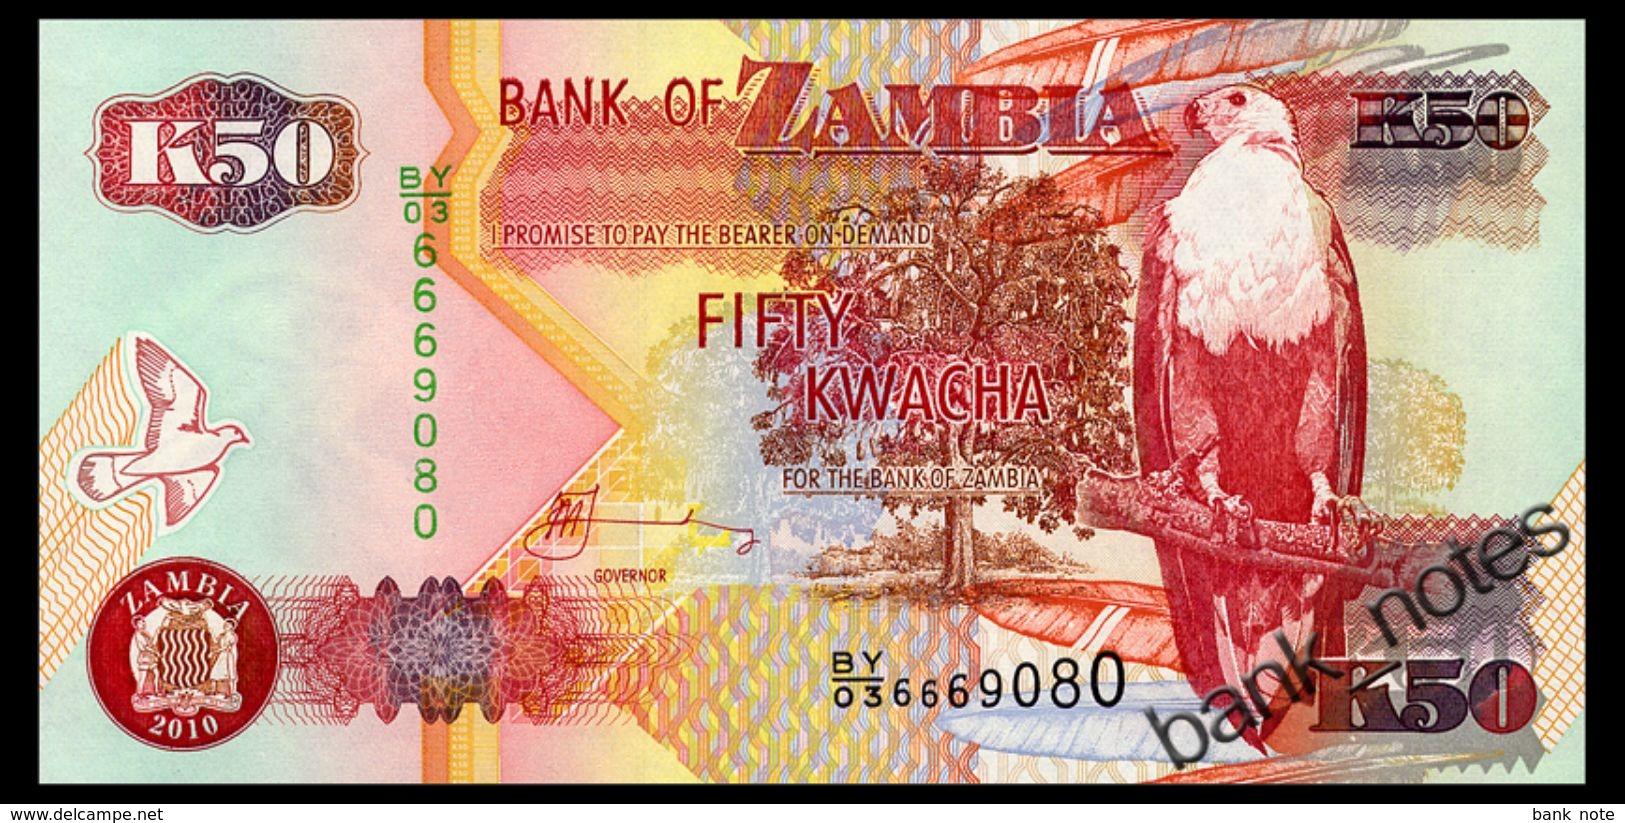 ZAMBIA 50 KWACHA 2010 Pick 37i Unc - Zambia